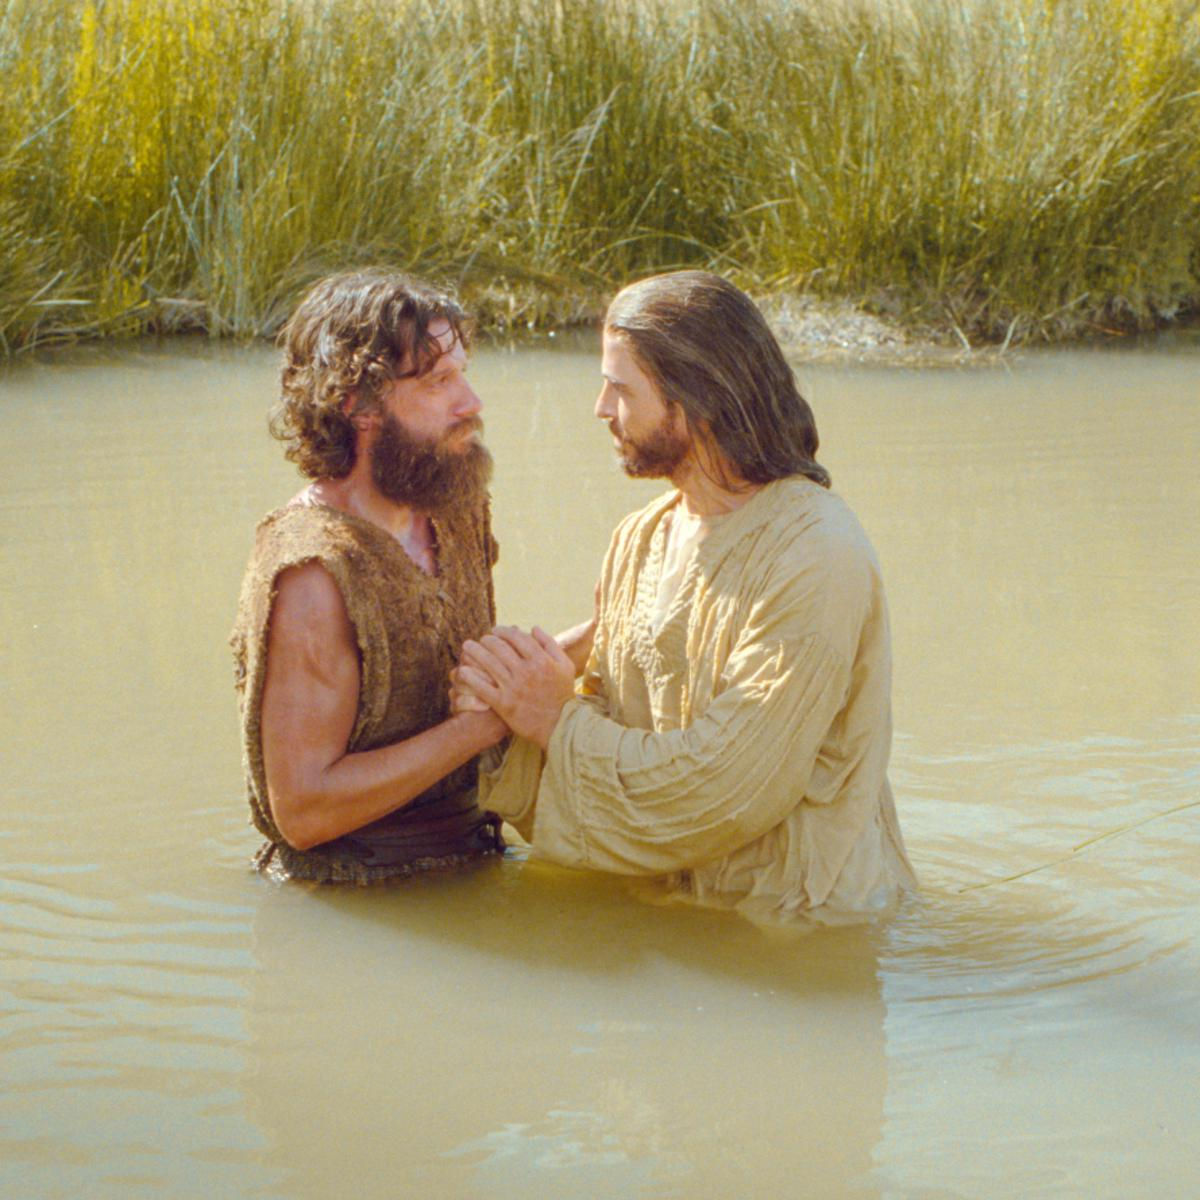 John baptized Jesus Christ